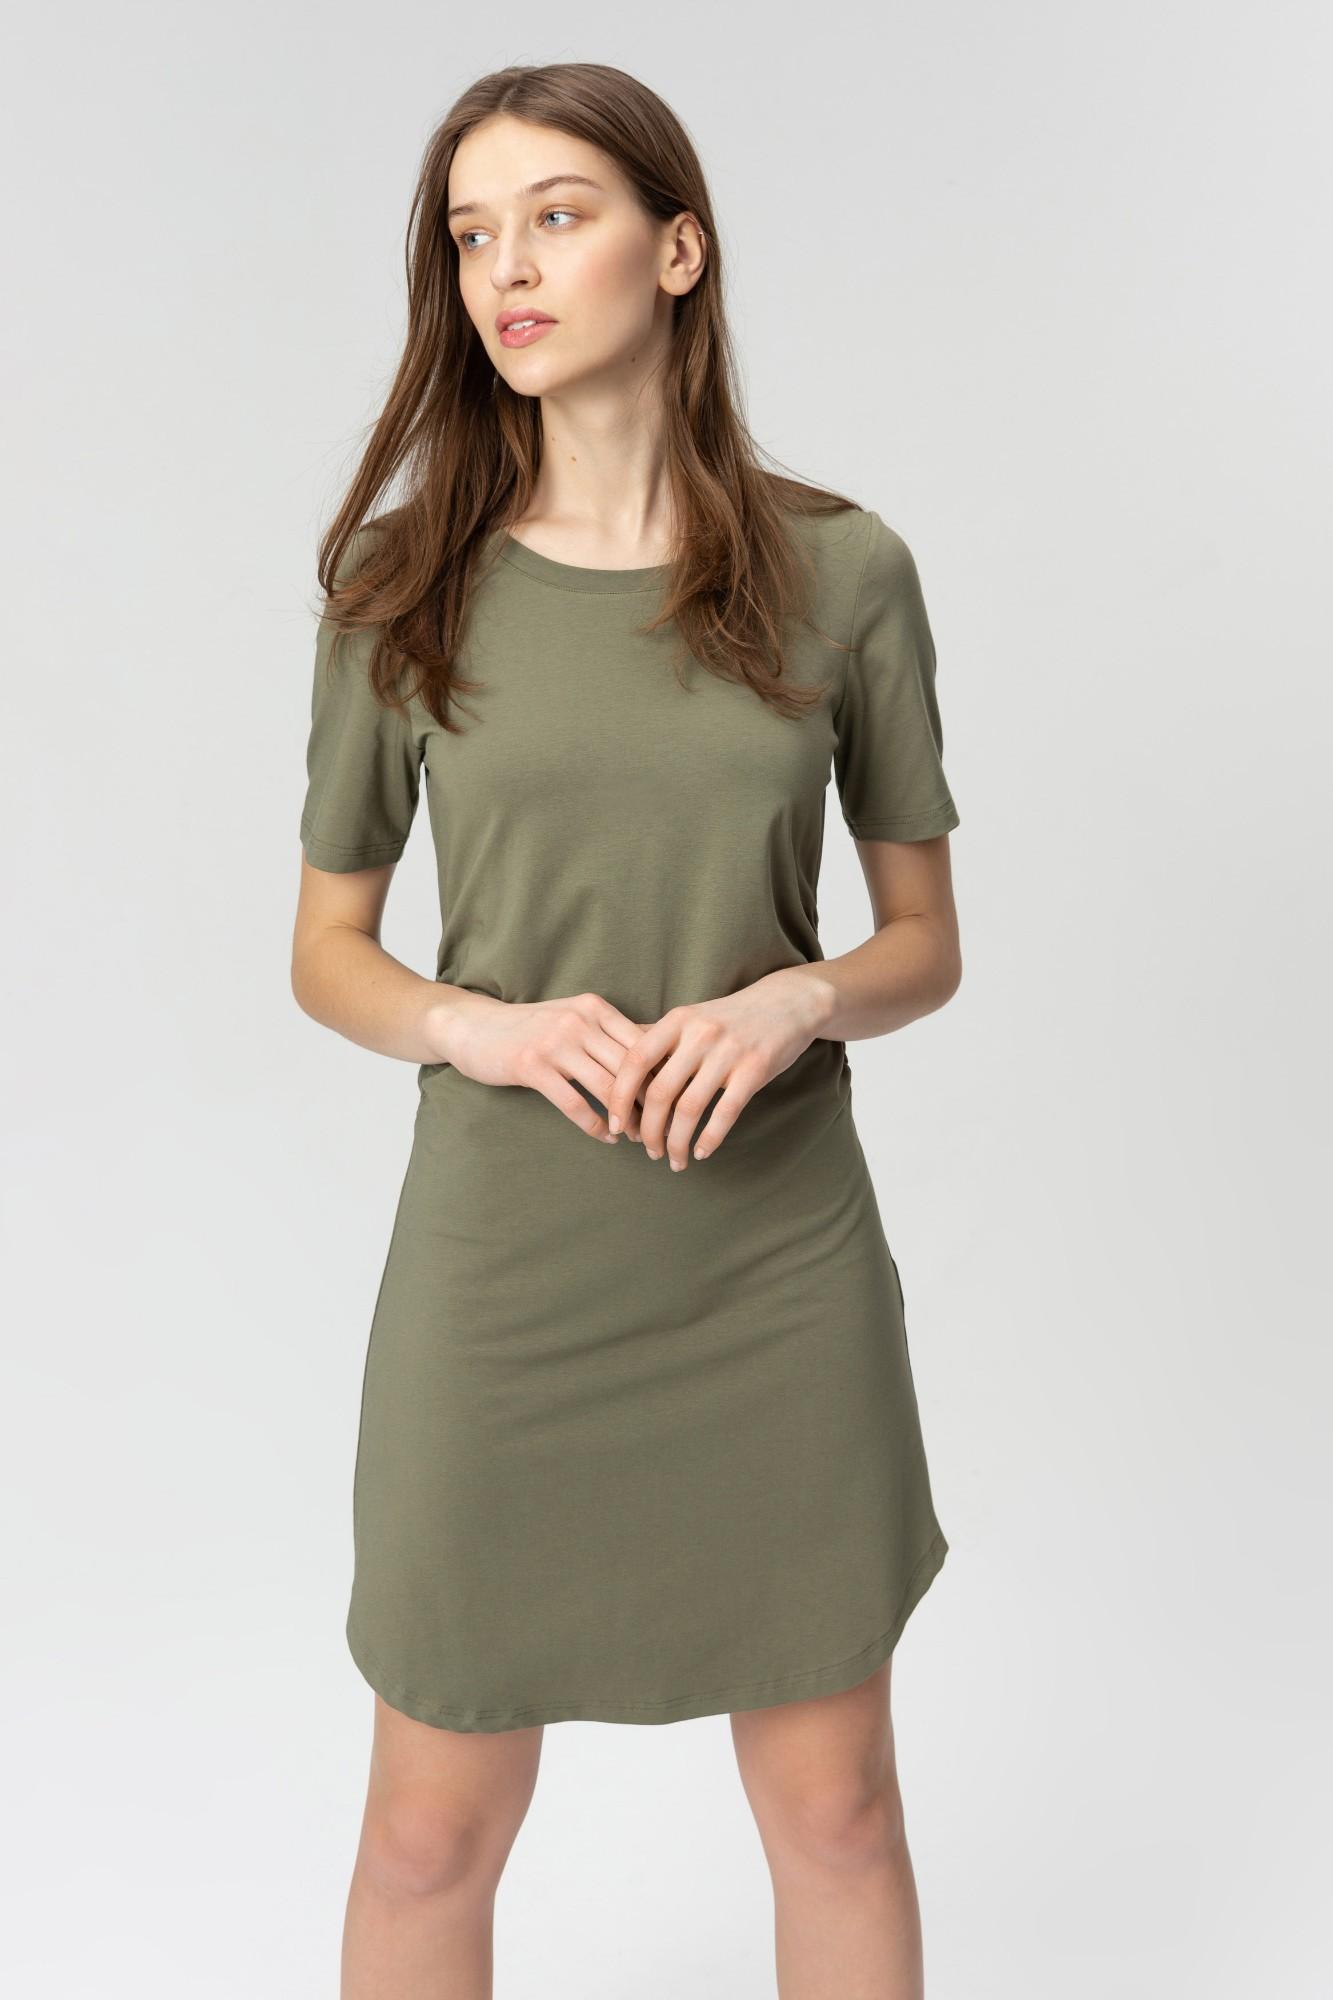 AUDIMAS Švelnaus modalo suknelė 2011-033 Deep Lichen Green S